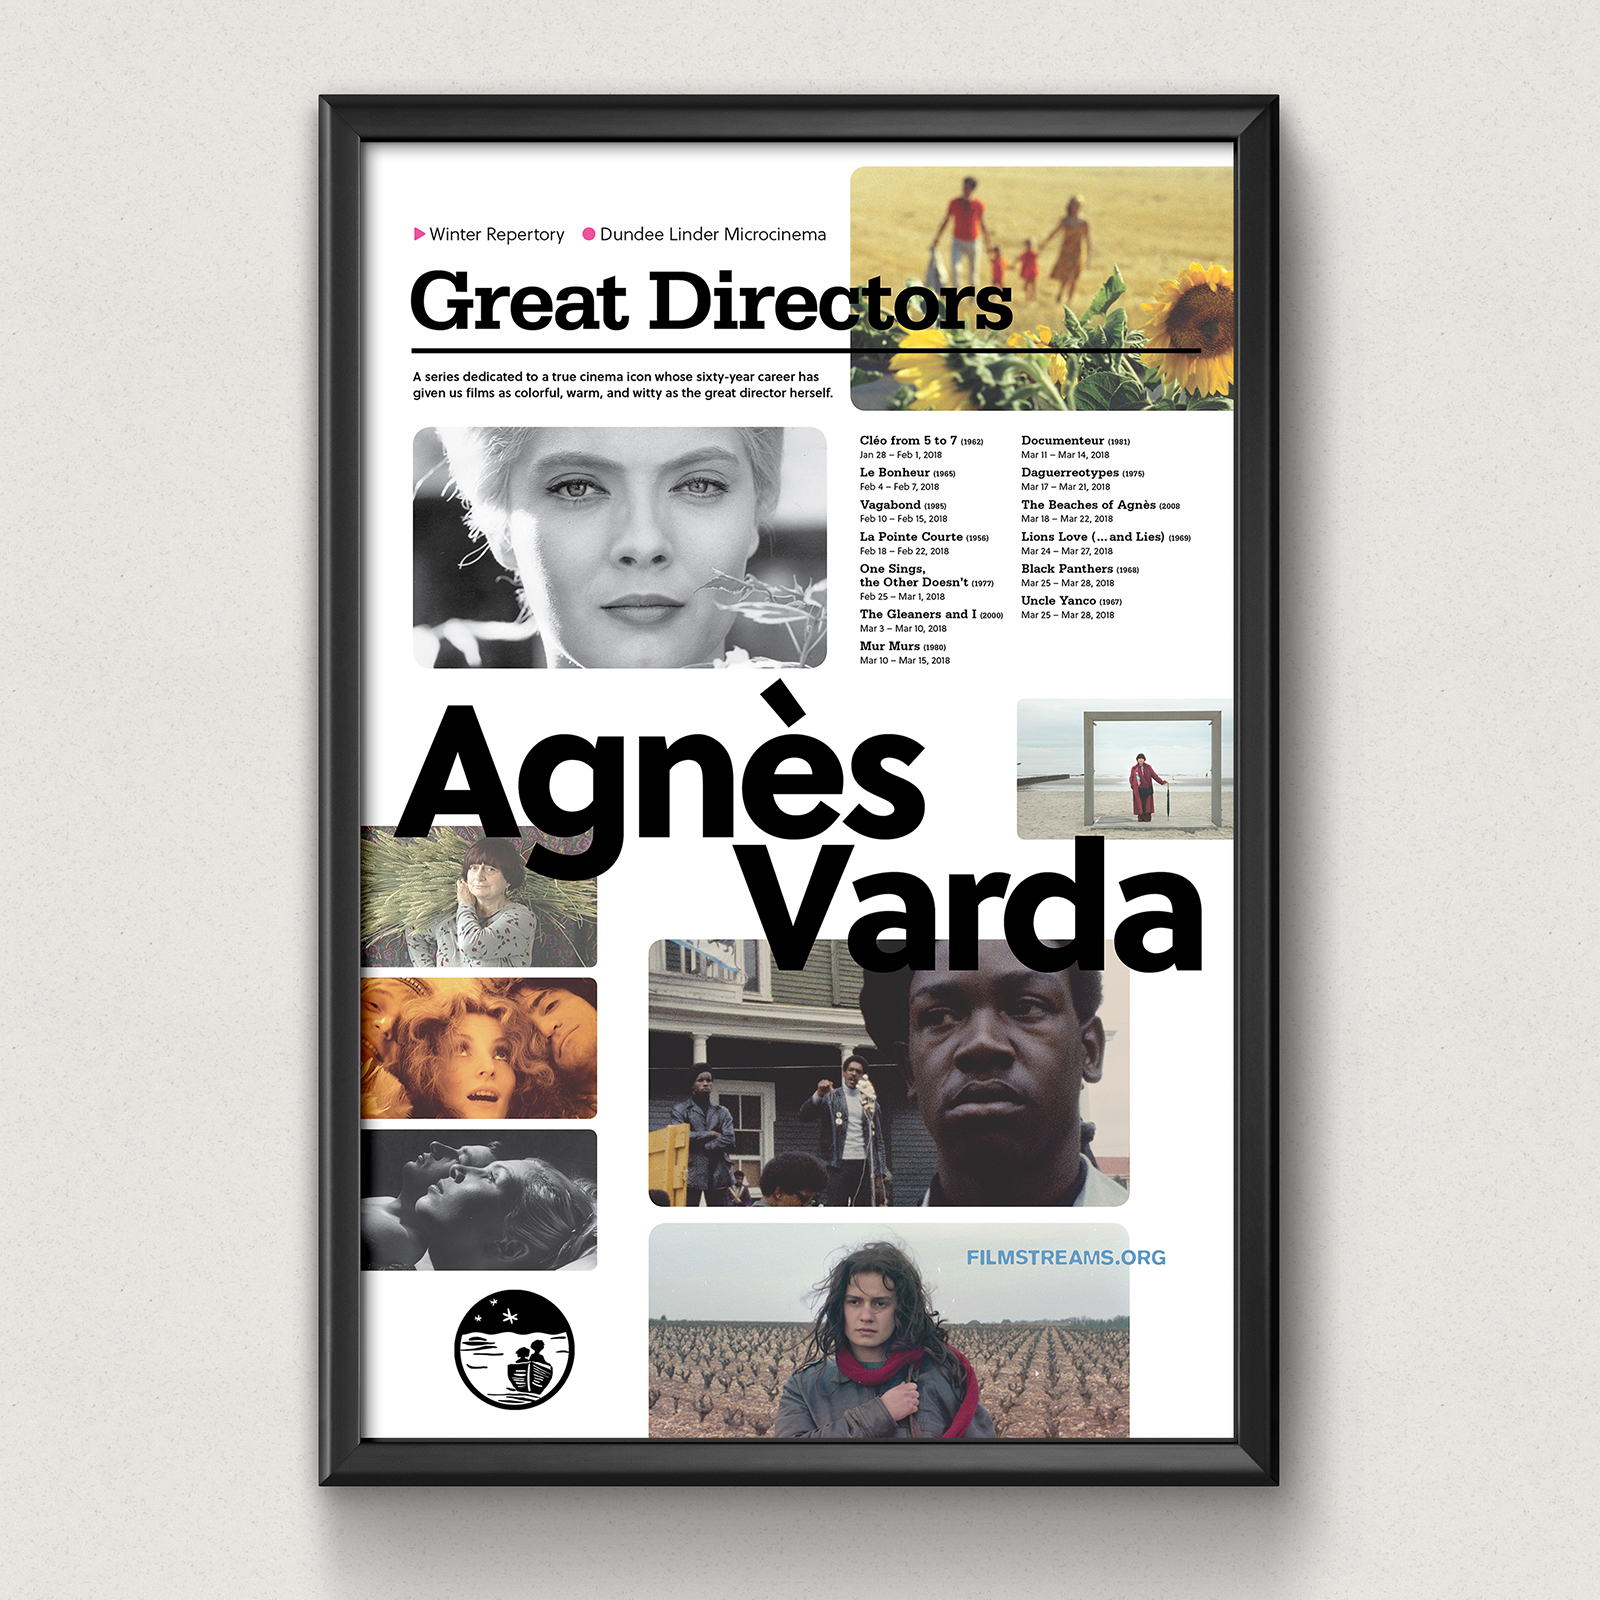 jkdc_filmstreams-posters-agnesvarda.jpg